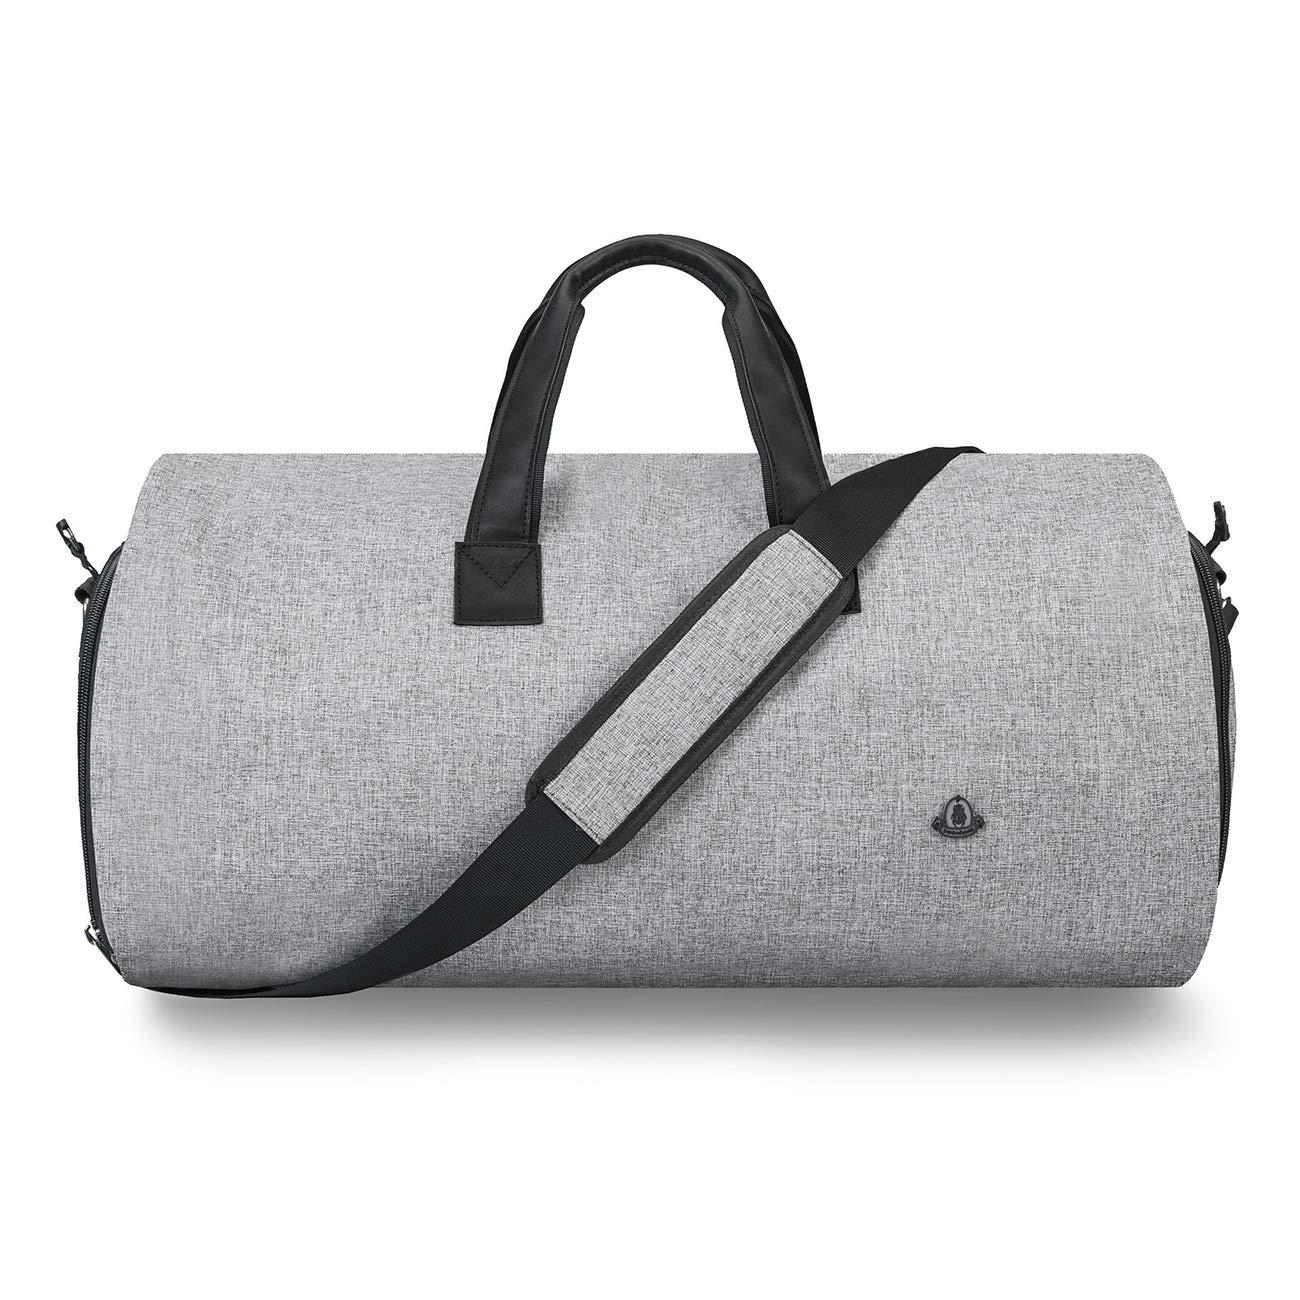 8a3b0988dc01 BUG Travel Garment Bag and Duffel,Convertible Garment Duffel Bag - 2 in 1  Suit Garment Bag,Light Gray